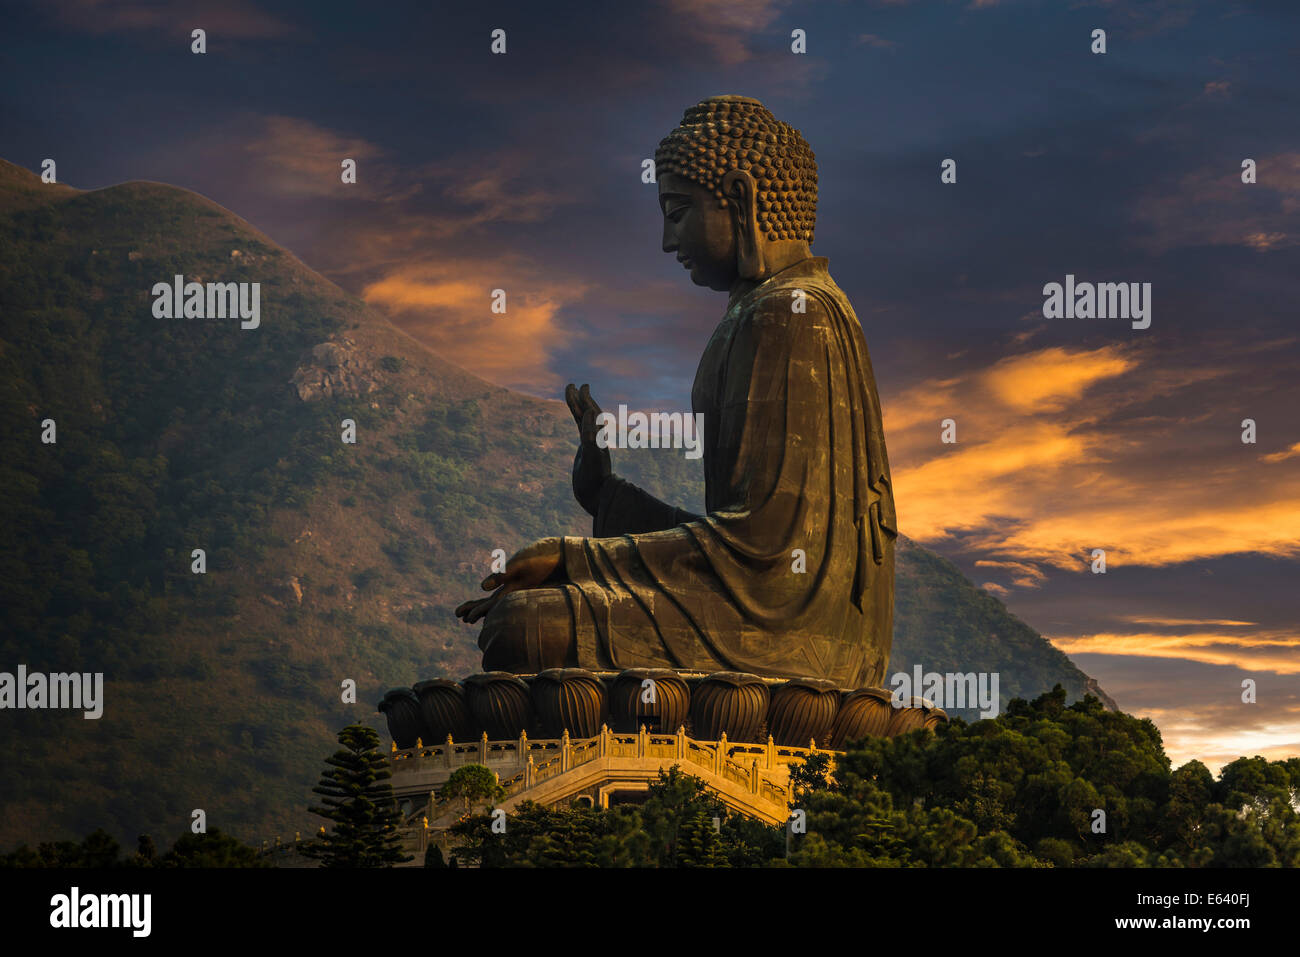 Tian Tan Buddha statue, Lantau Island, Hong Kong, China - Stock Image